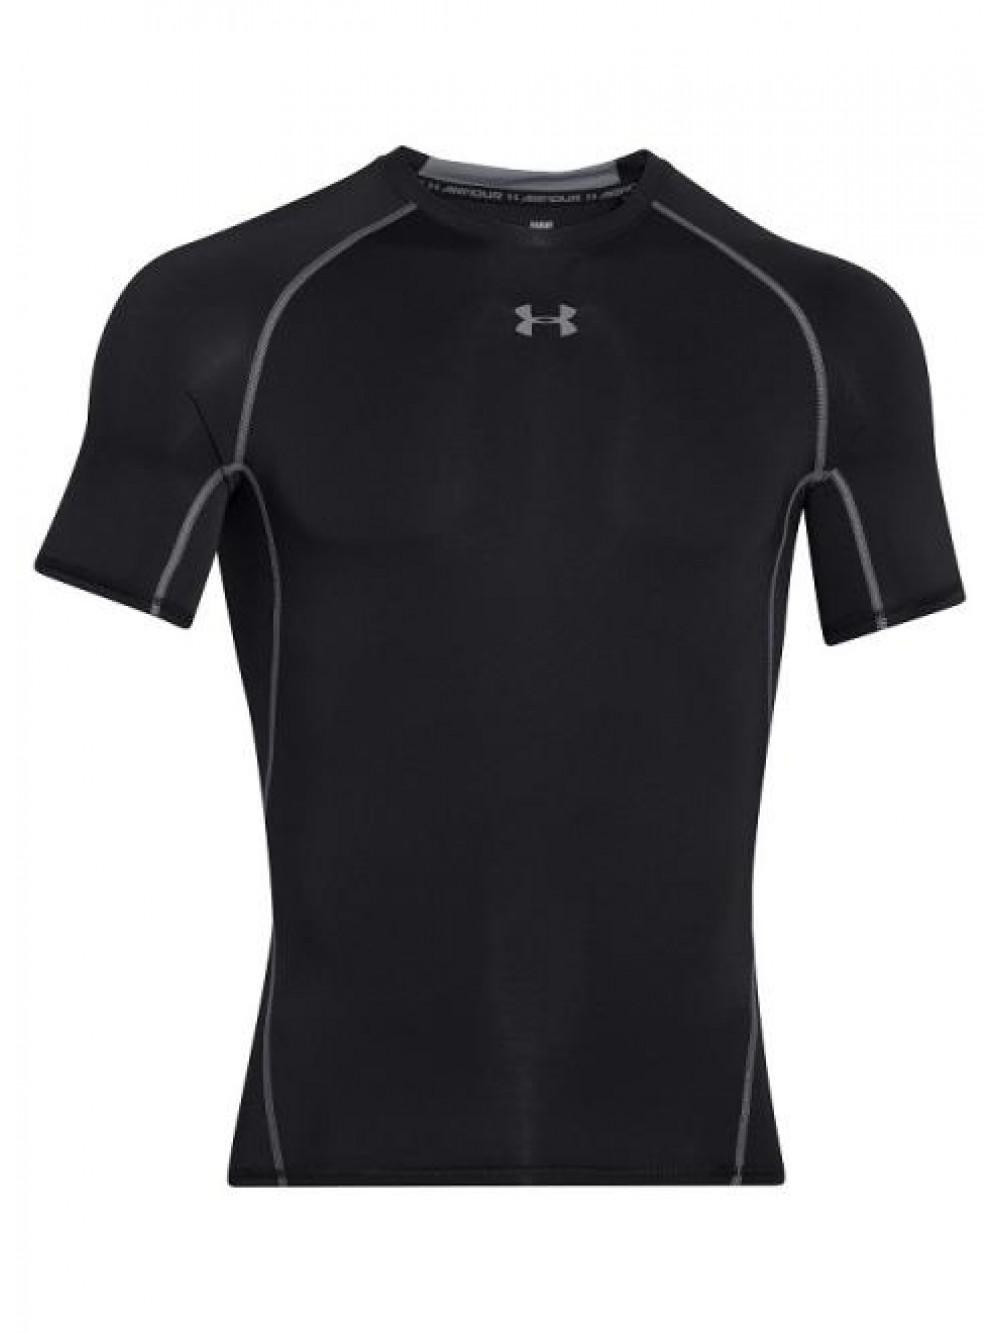 Pánske kompresné tričko Under Armour HeatGear Short Sleeve čierne